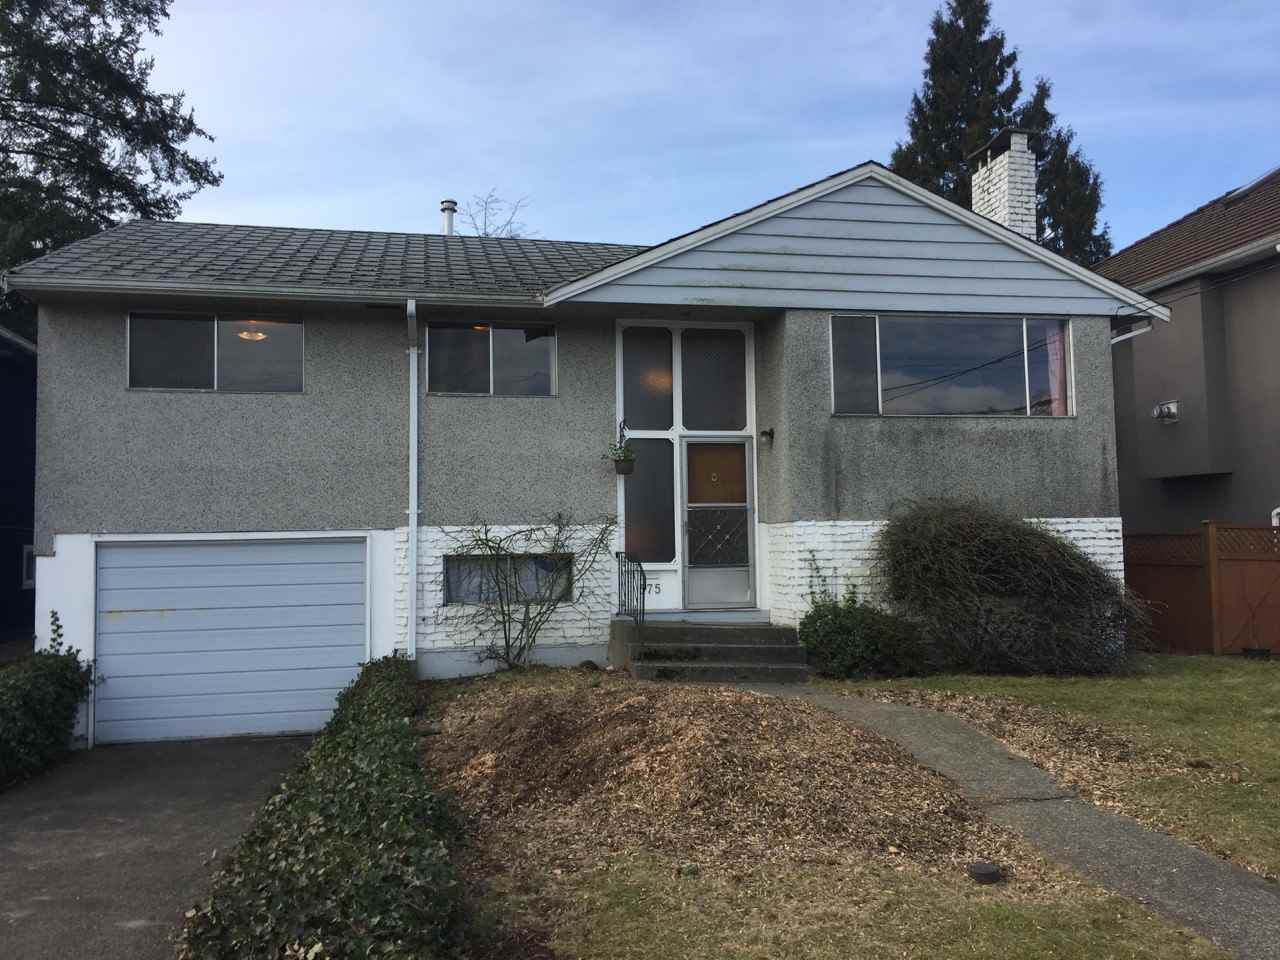 Main Photo: 575 DUNCAN AVENUE: House for sale : MLS®# R2130185